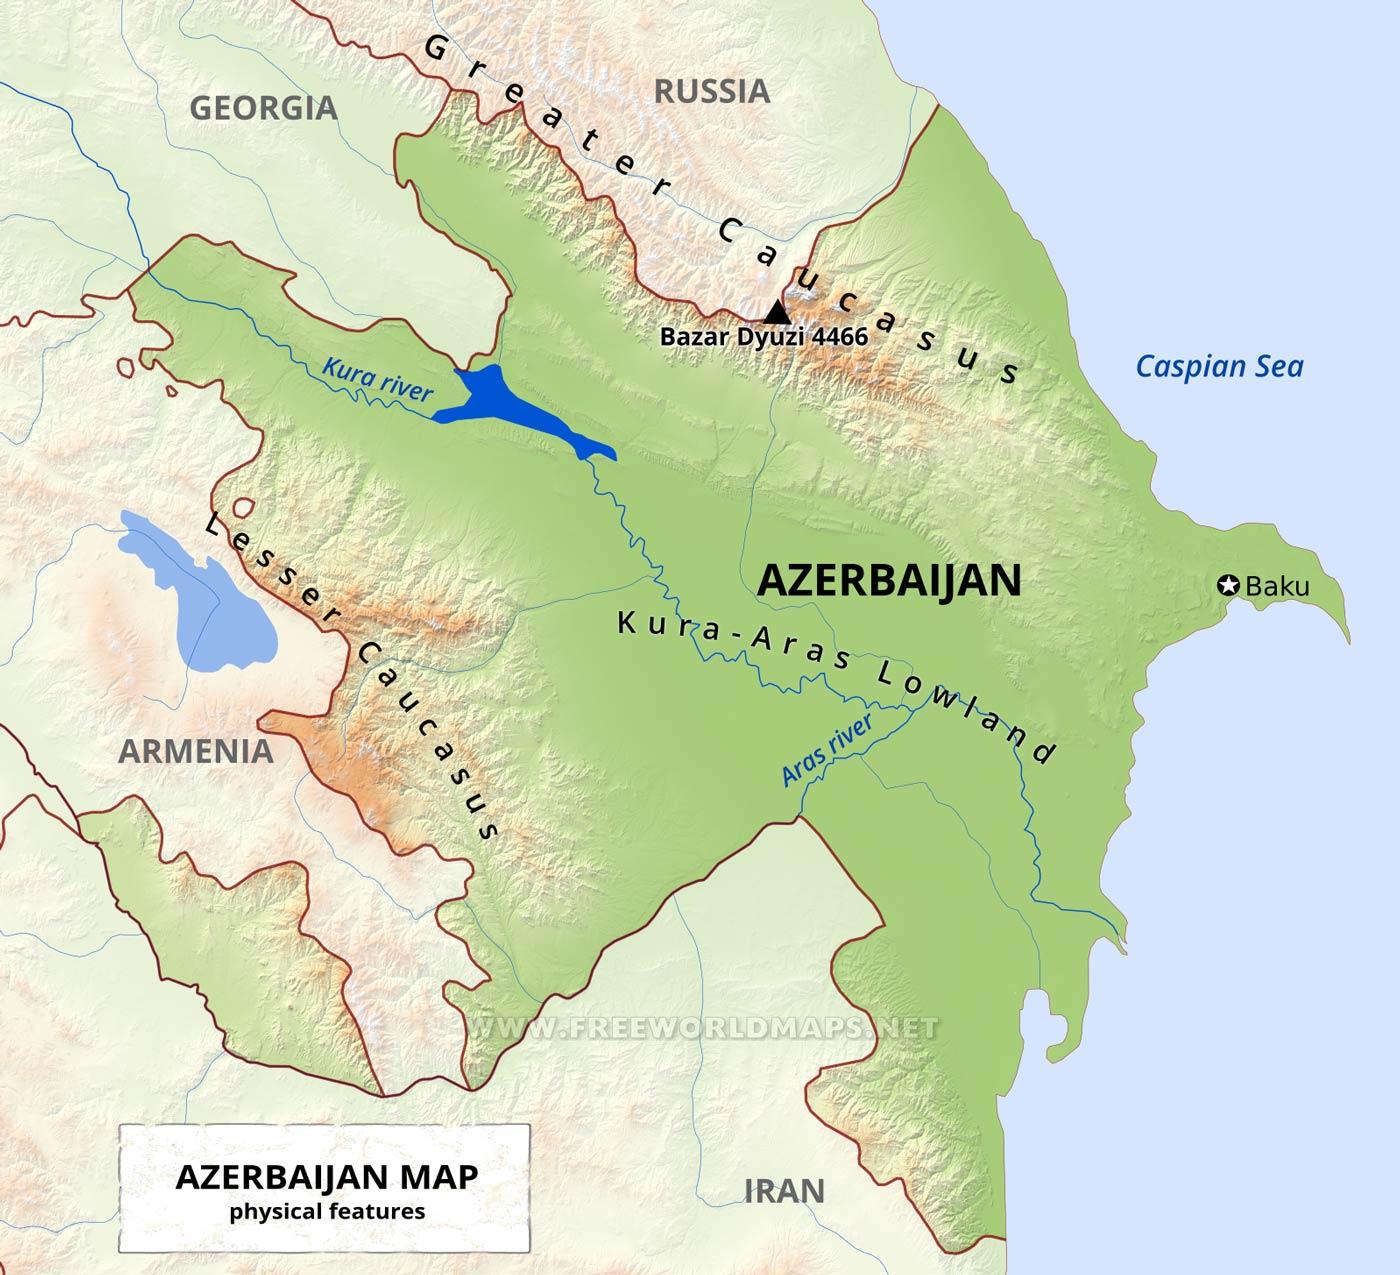 Baku dating site - free online dating in Baku (Azerbaijan)